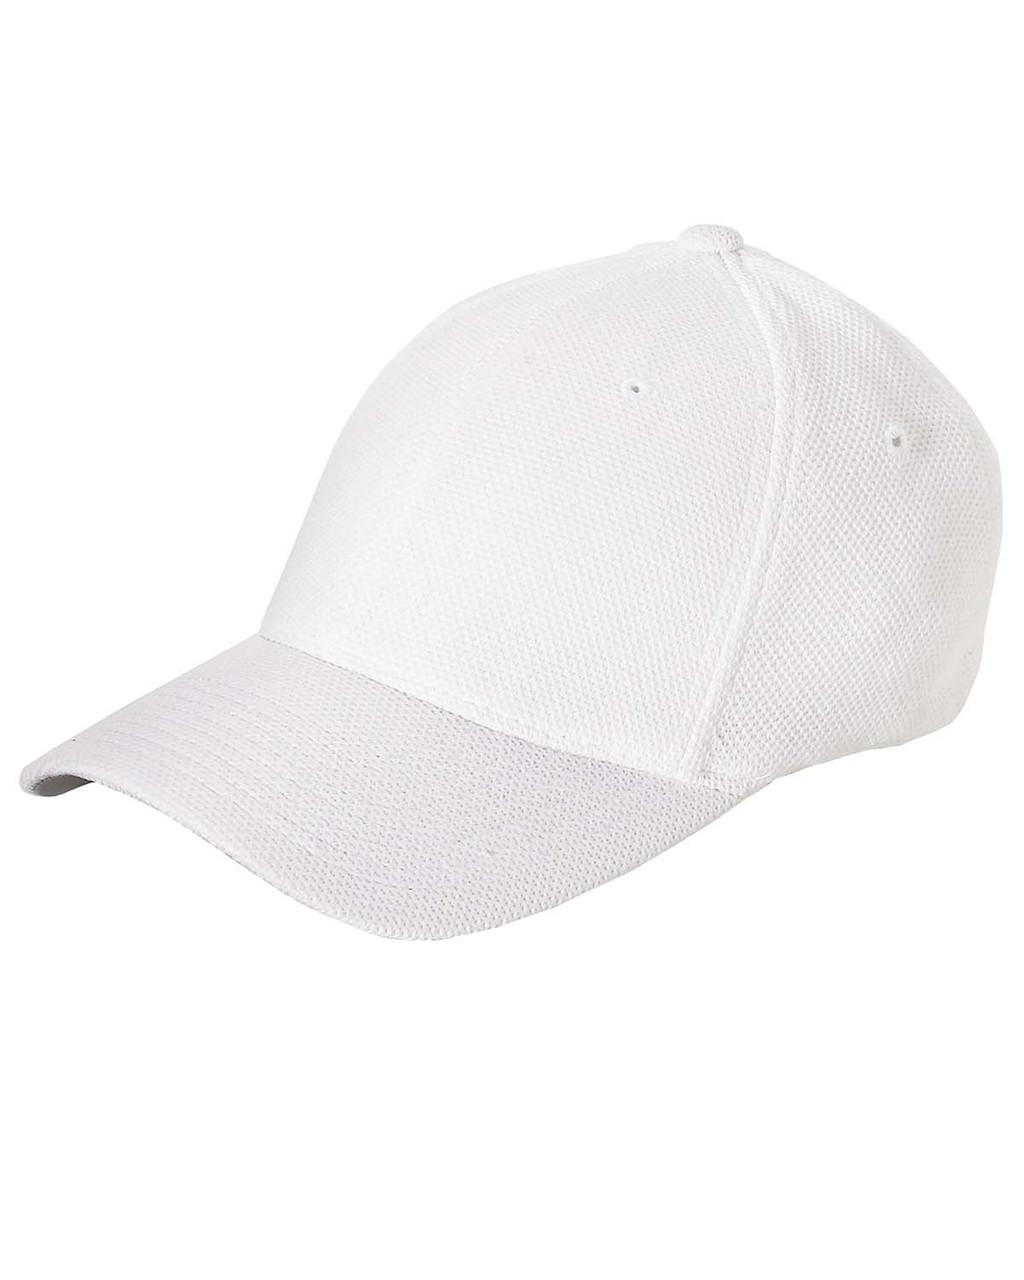 6577CD Headwear /& Baseball Caps-Flexfit cool and dry piqué mesh